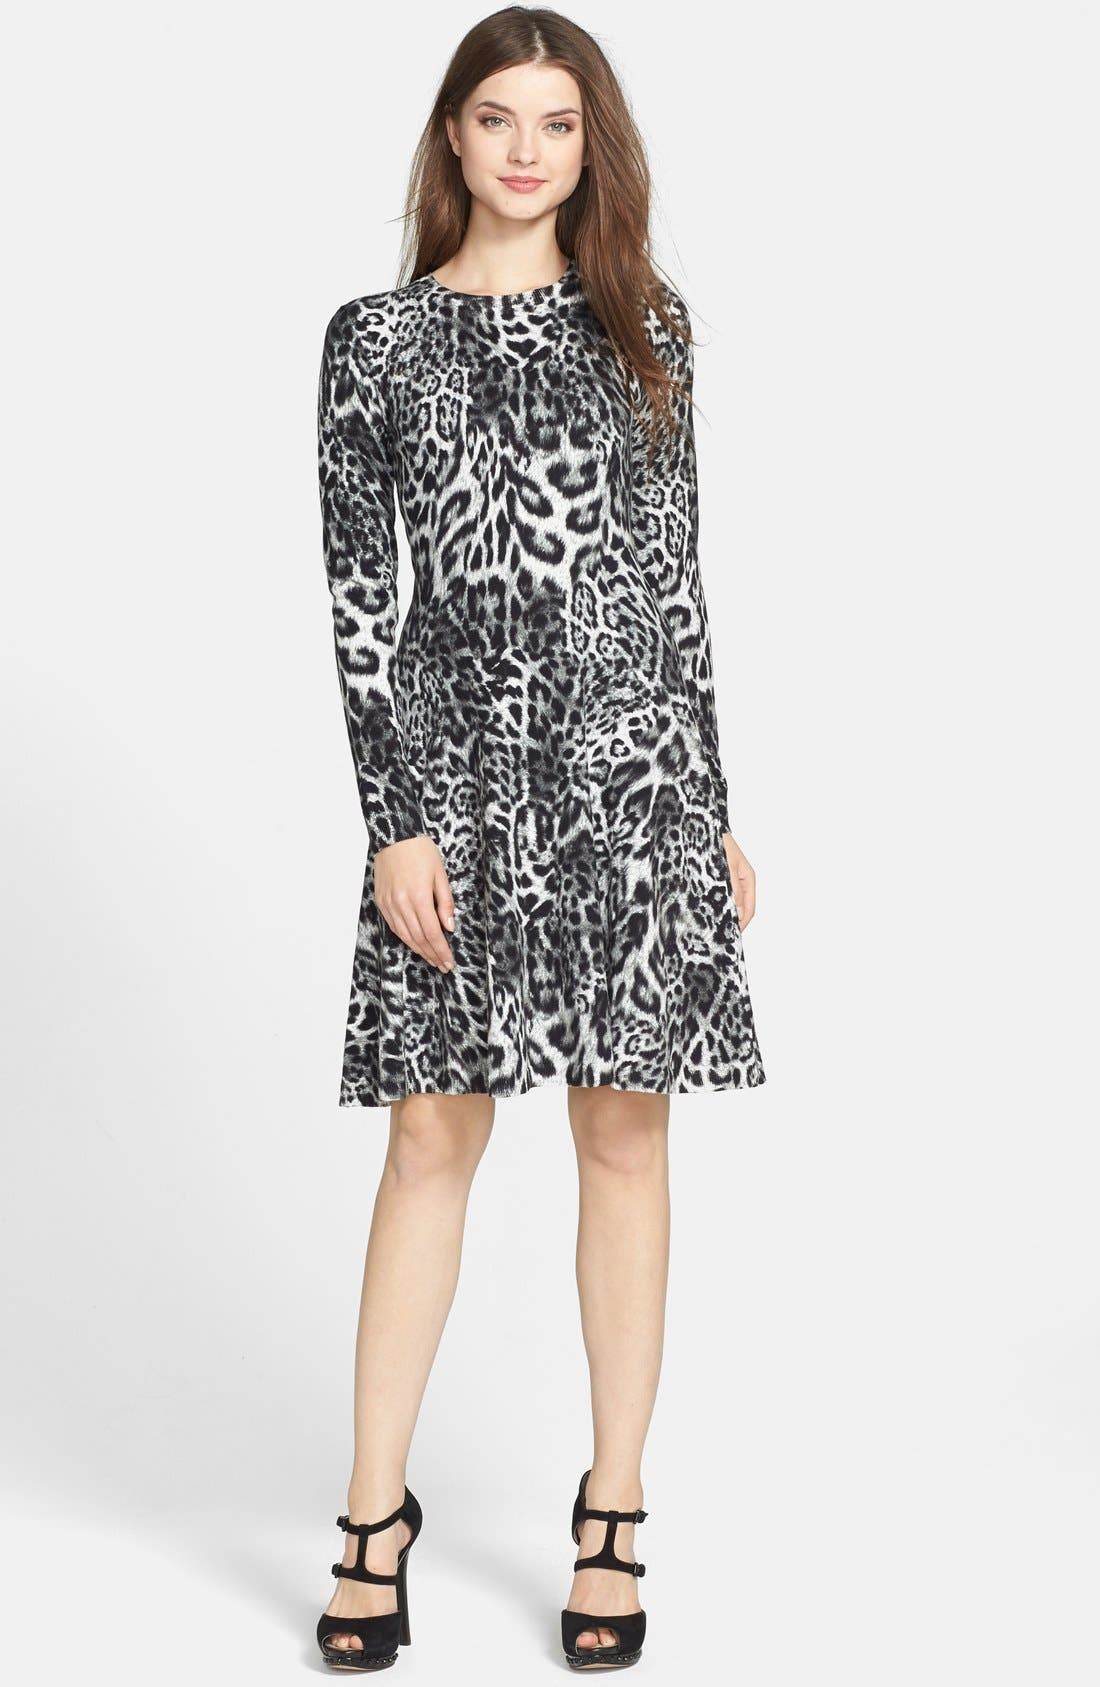 Main Image - MICHAEL Michael Kors 'Fremont' Leopard Print Fit & Flare Dress (Regular & Petite)